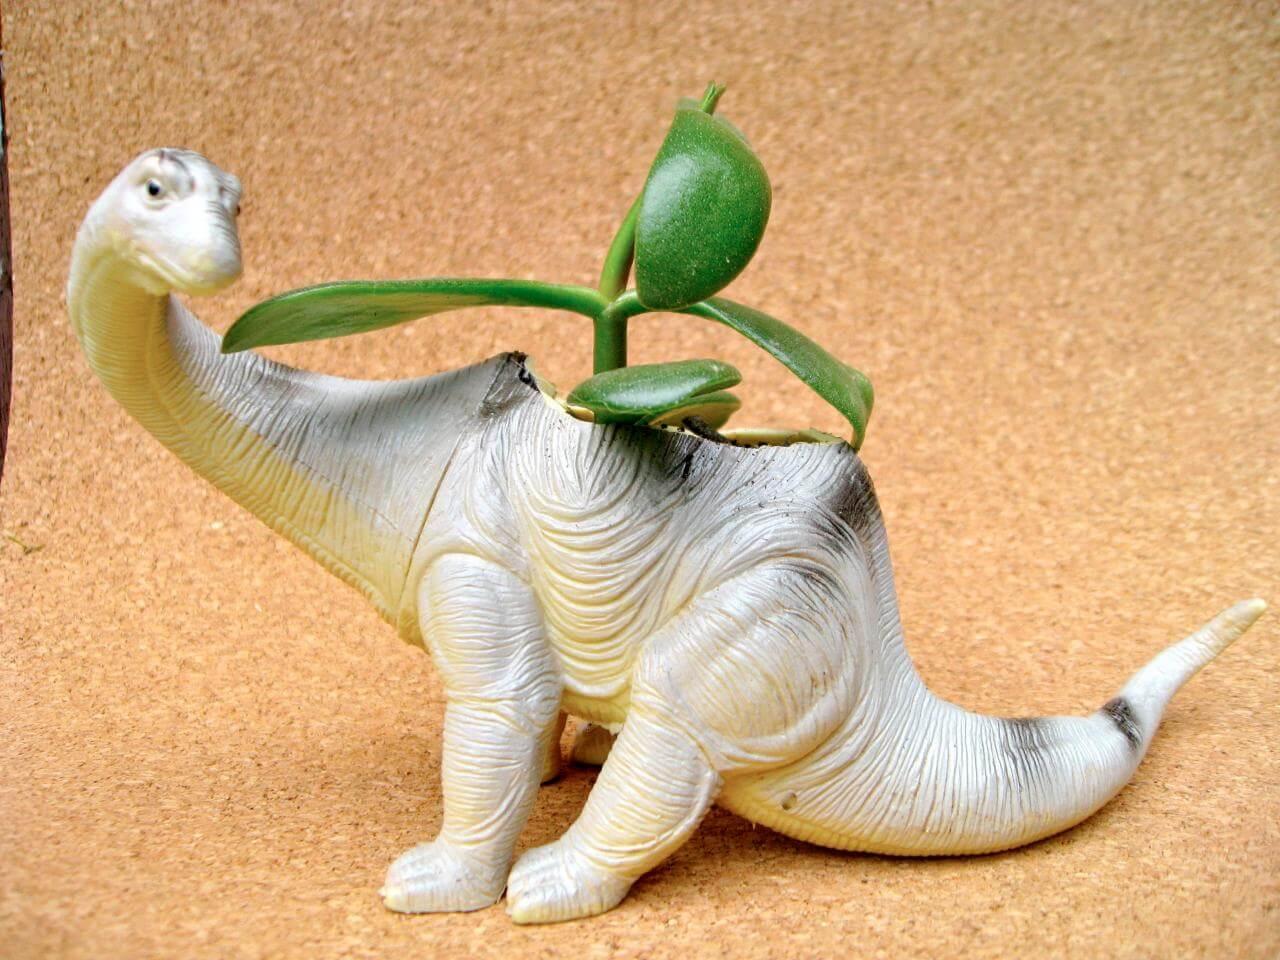 Here's a plant-o-sorus